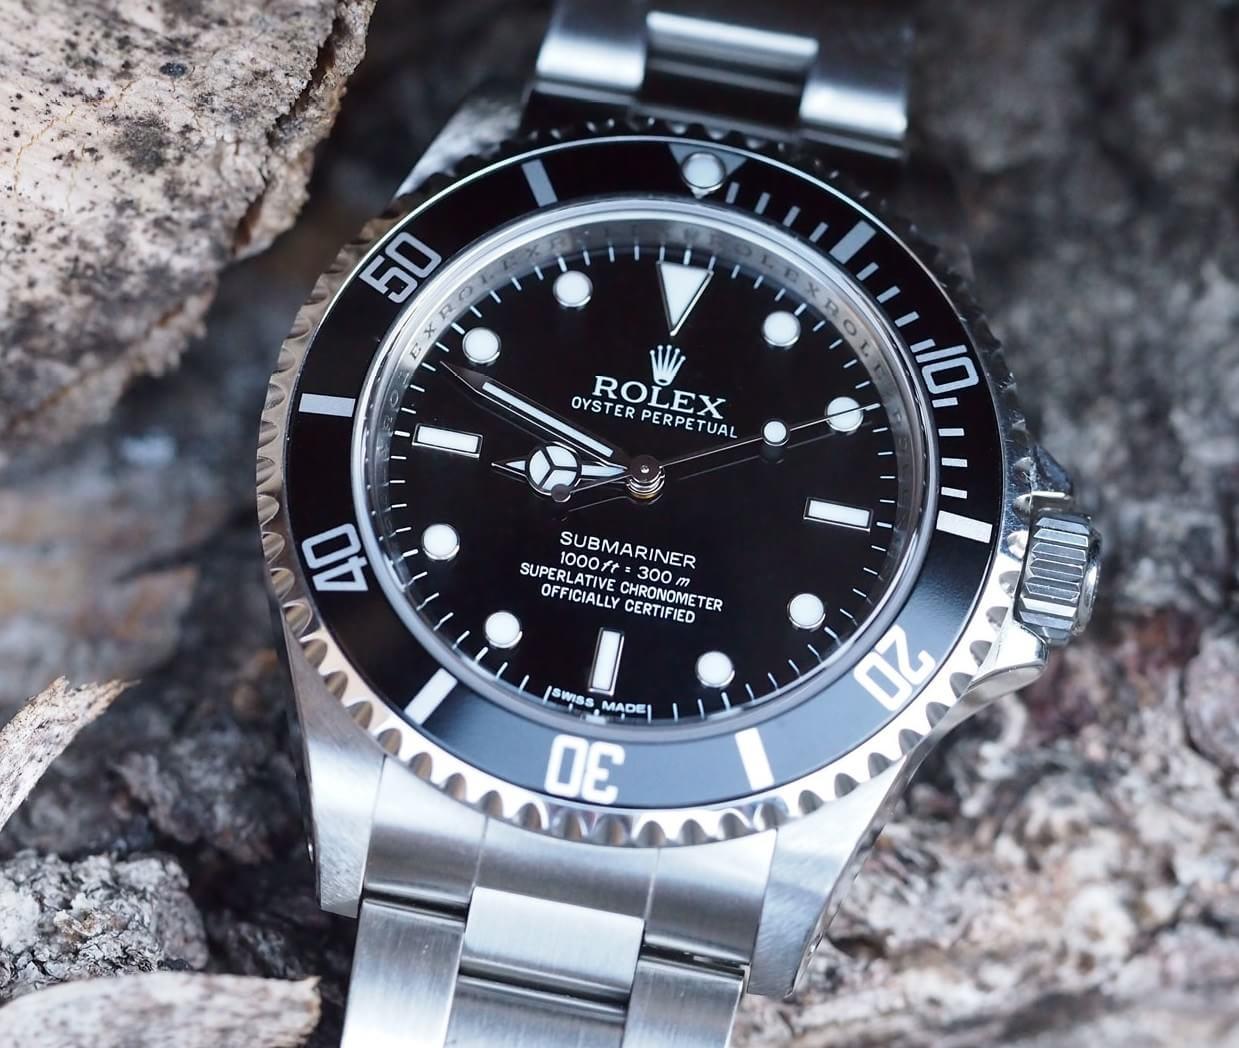 21b0c885e0f Relojes de leyenda rolex submariner jpg 1239x1048 The rolex submariner